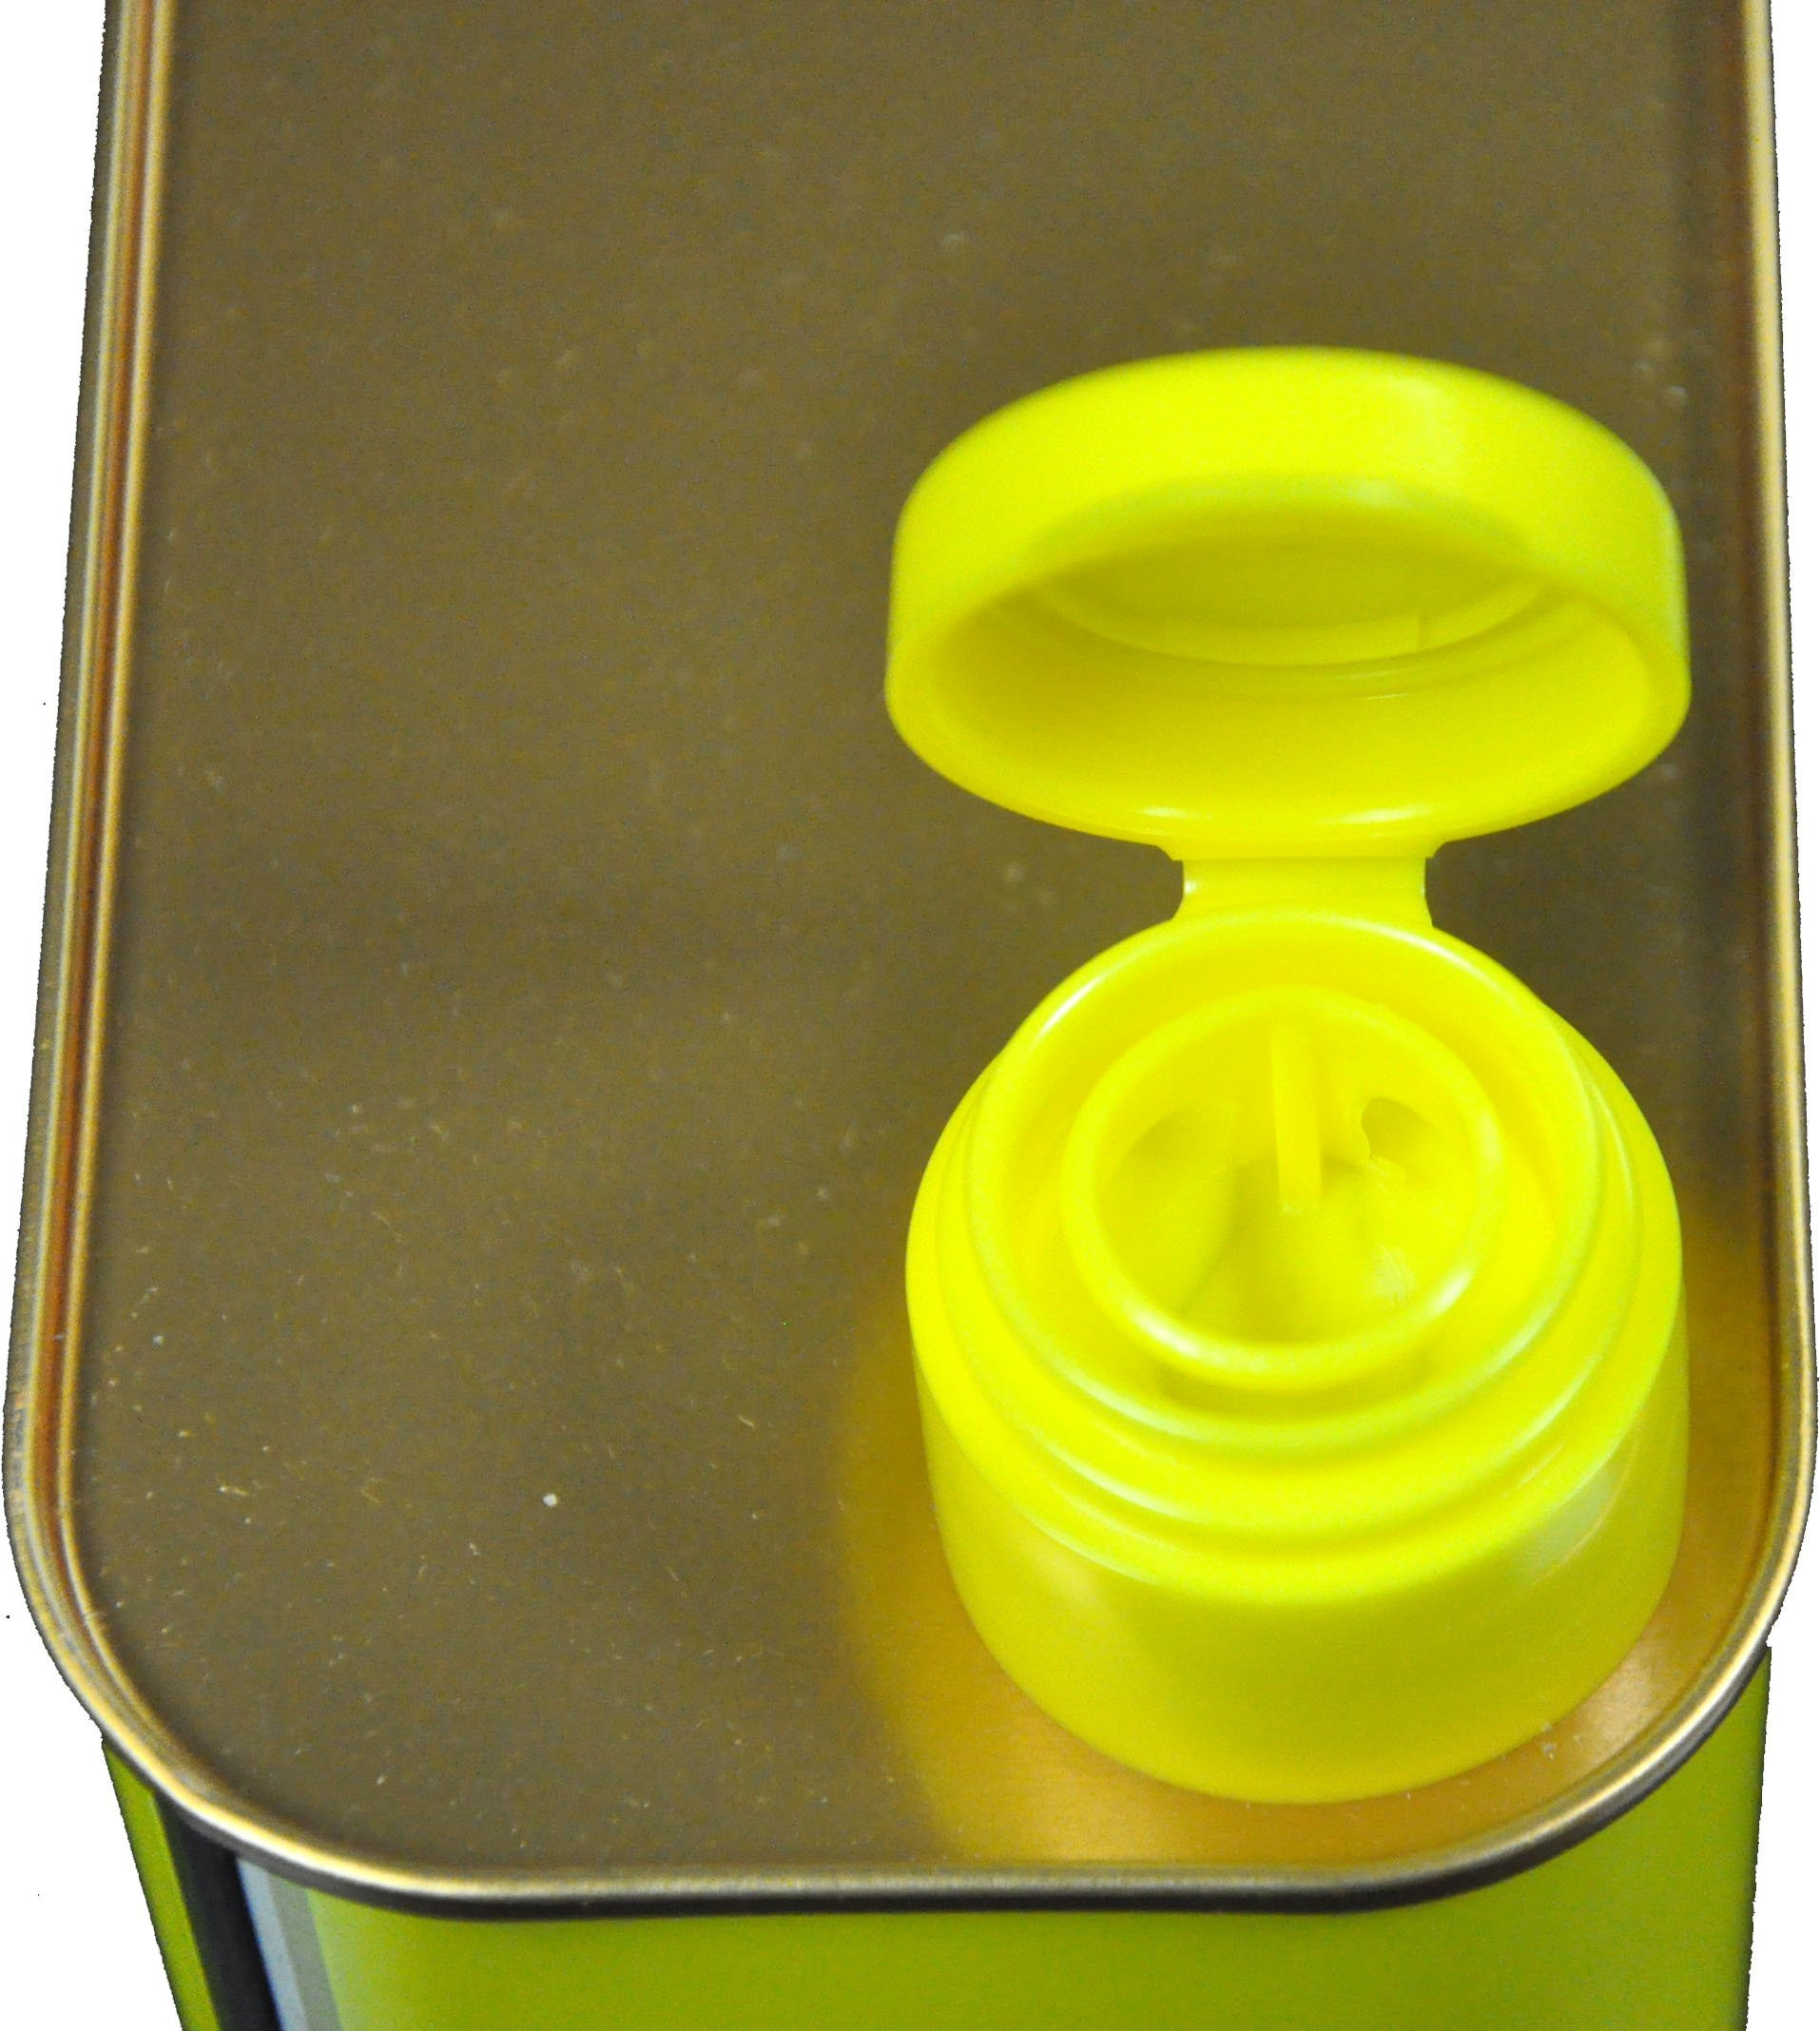 Premium Roasted Ottogi Sesame Oil (56 fl.oz.: 1650ml) by Ottogi (Image #3)